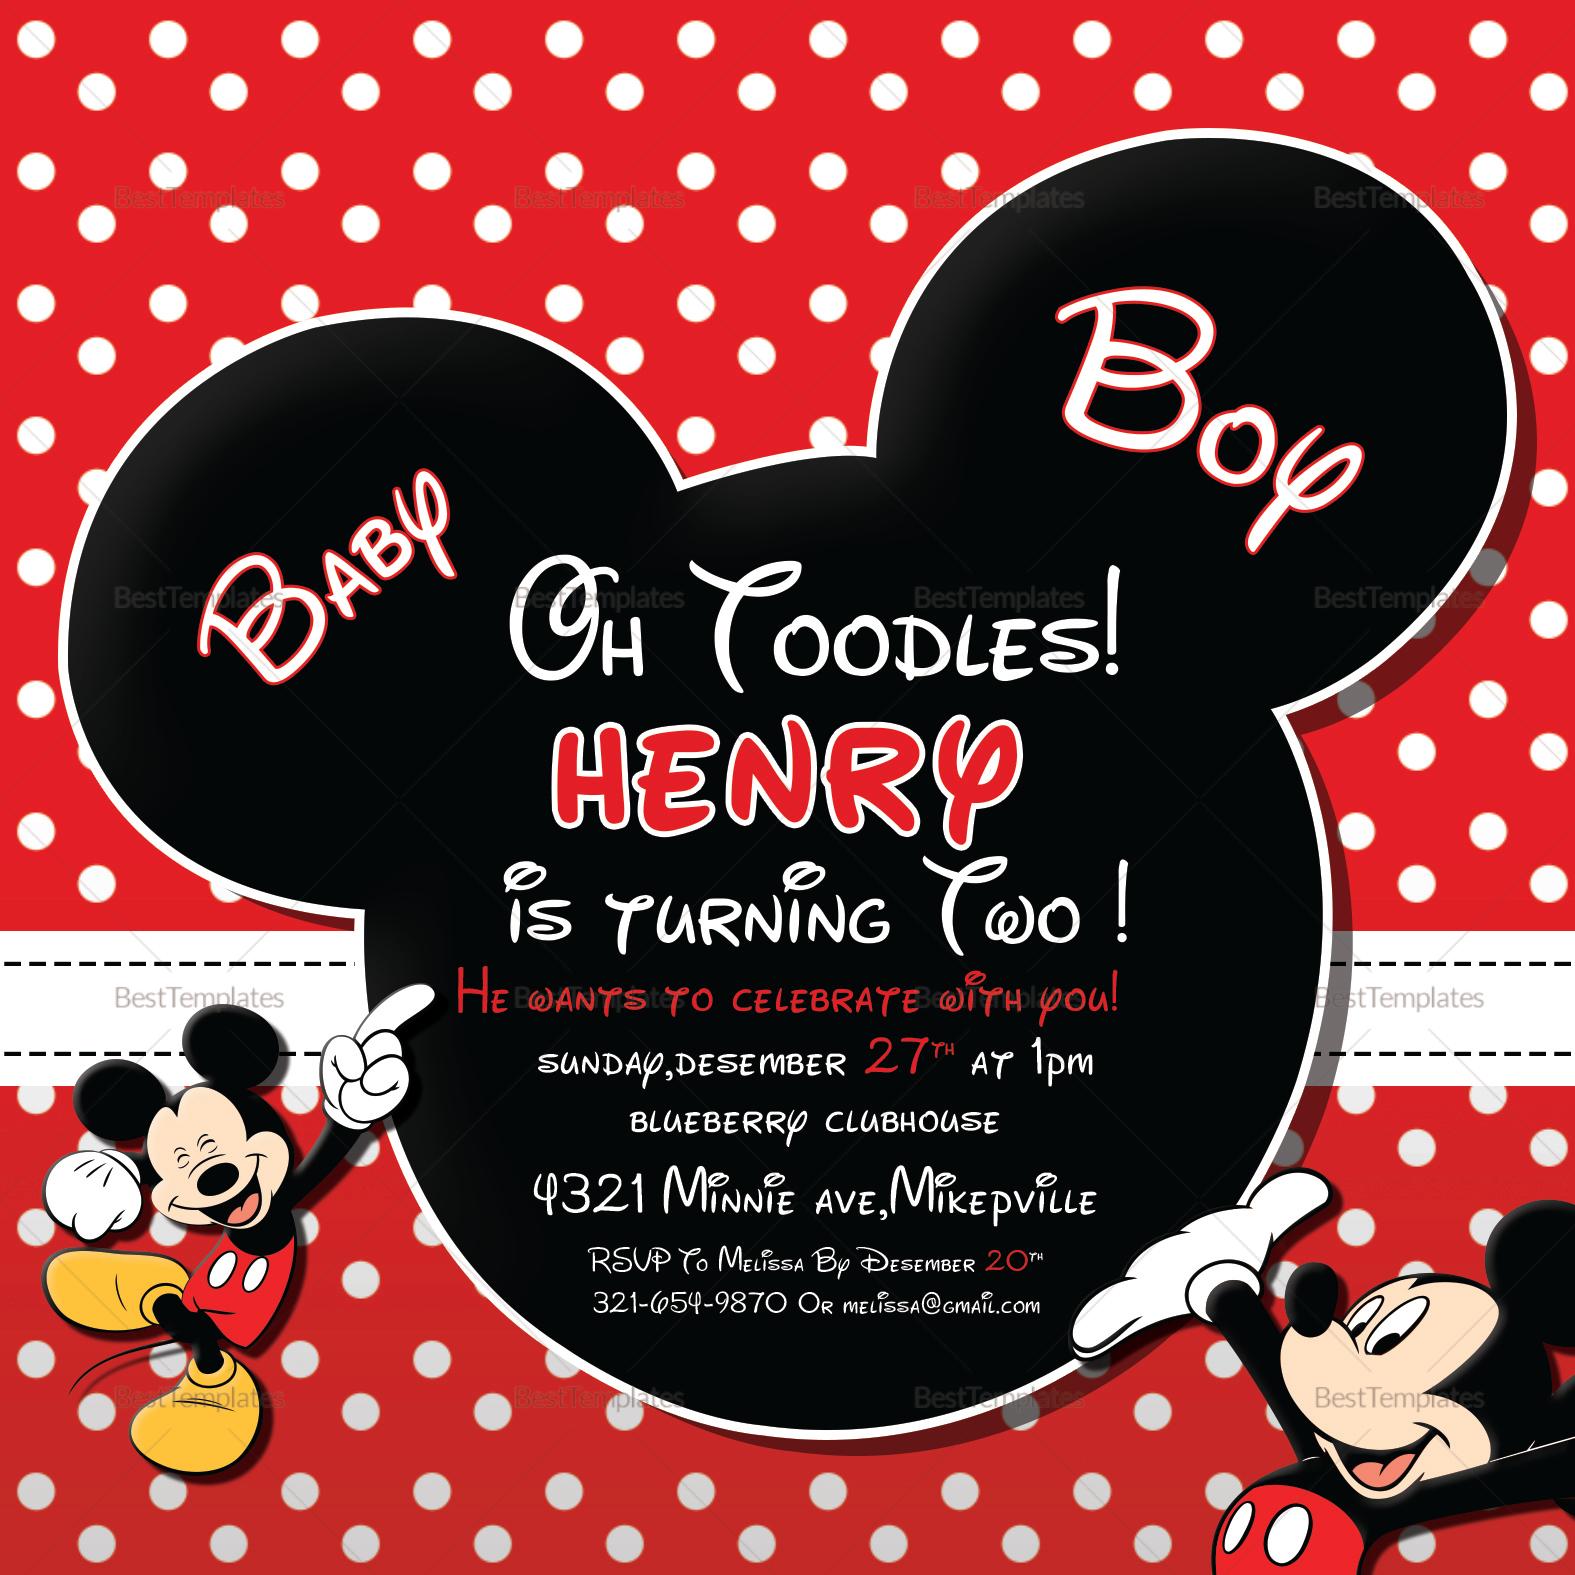 Cute Mickey Mouse Birthday Invitation Design Template in ...